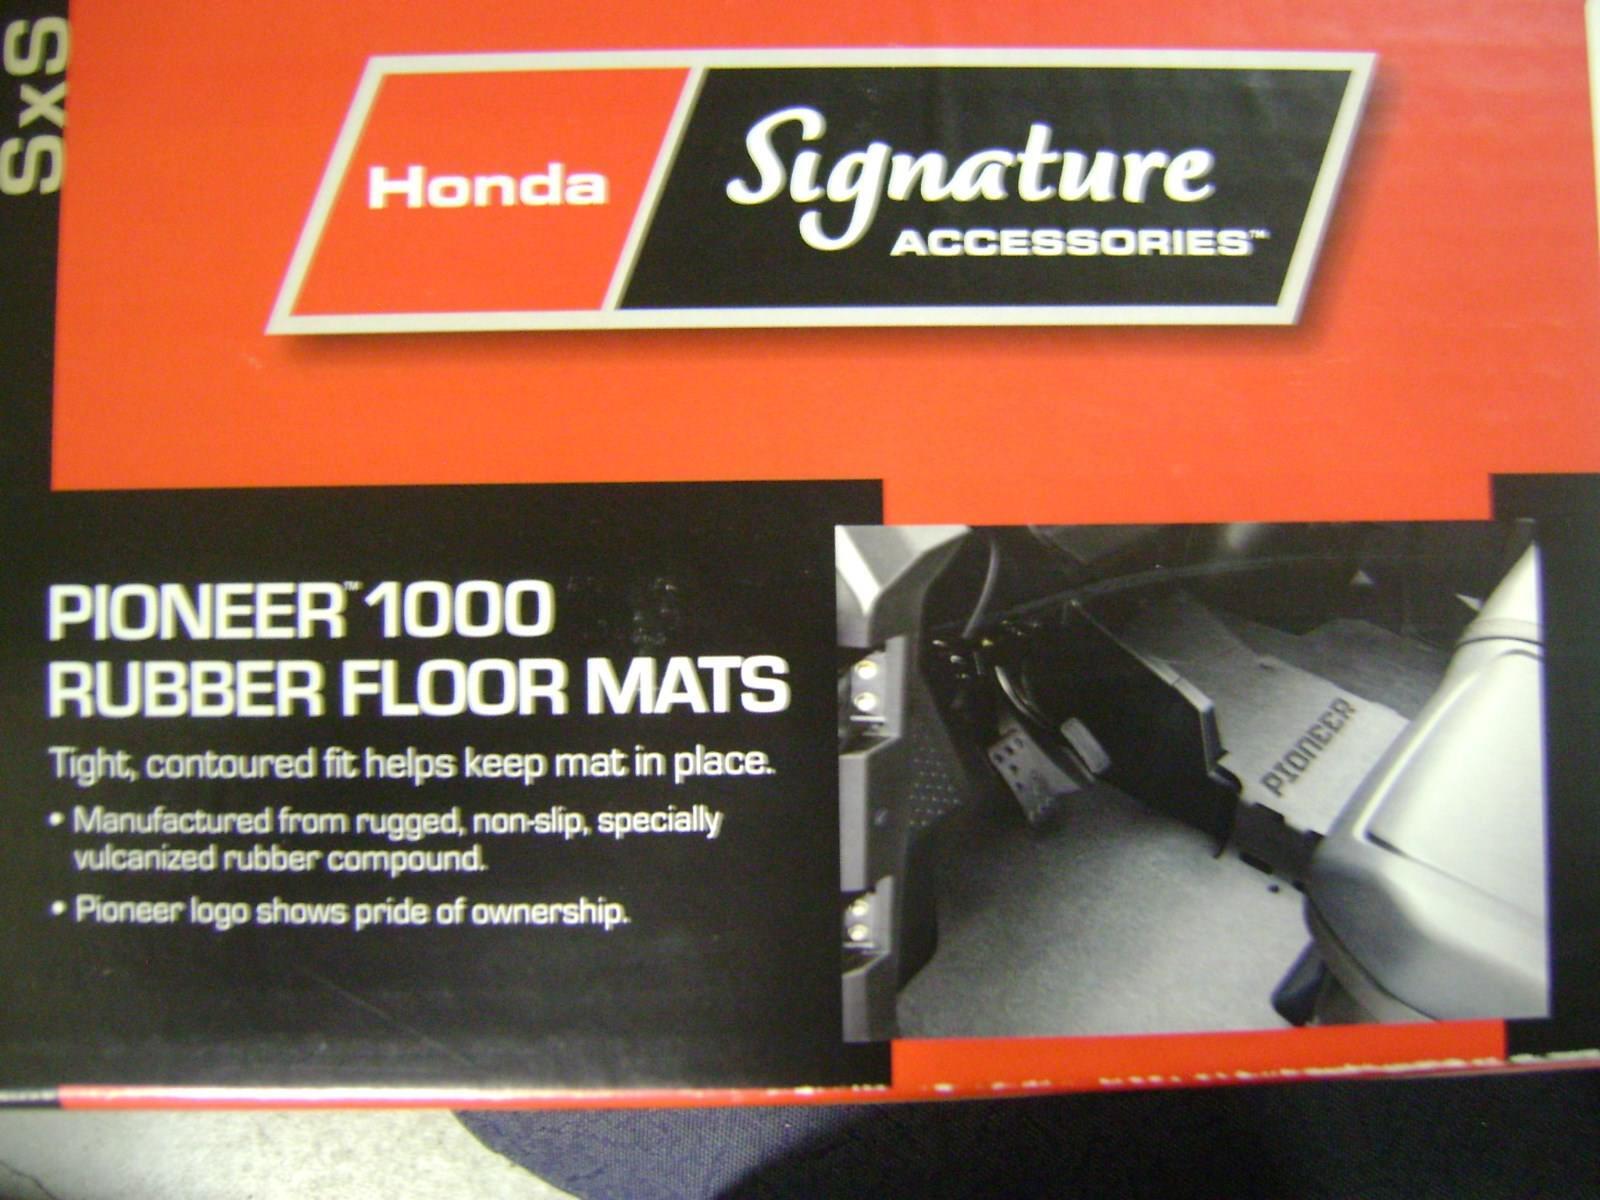 Honda Pioneer 1000 3p 5p Eps Le Deluxe Rubber Floor Mats 0sp63 Hl4 Cargo Tray 101 Ebay